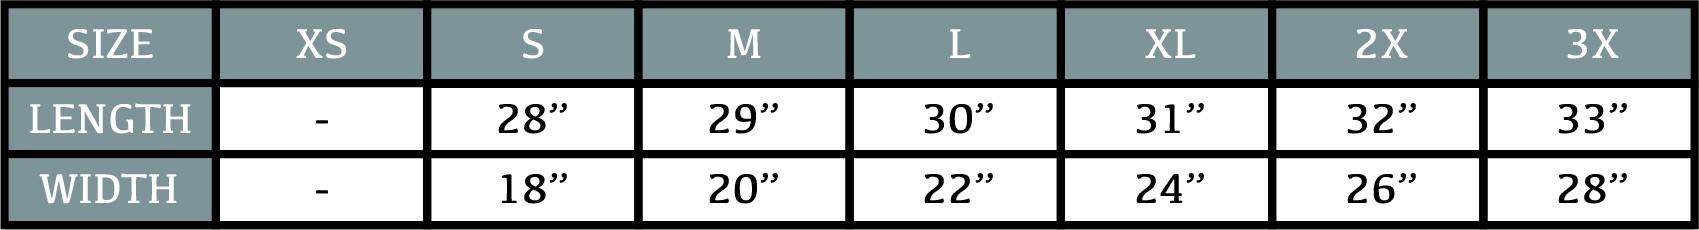 NL LS Performance Tee Size Chart.jpg